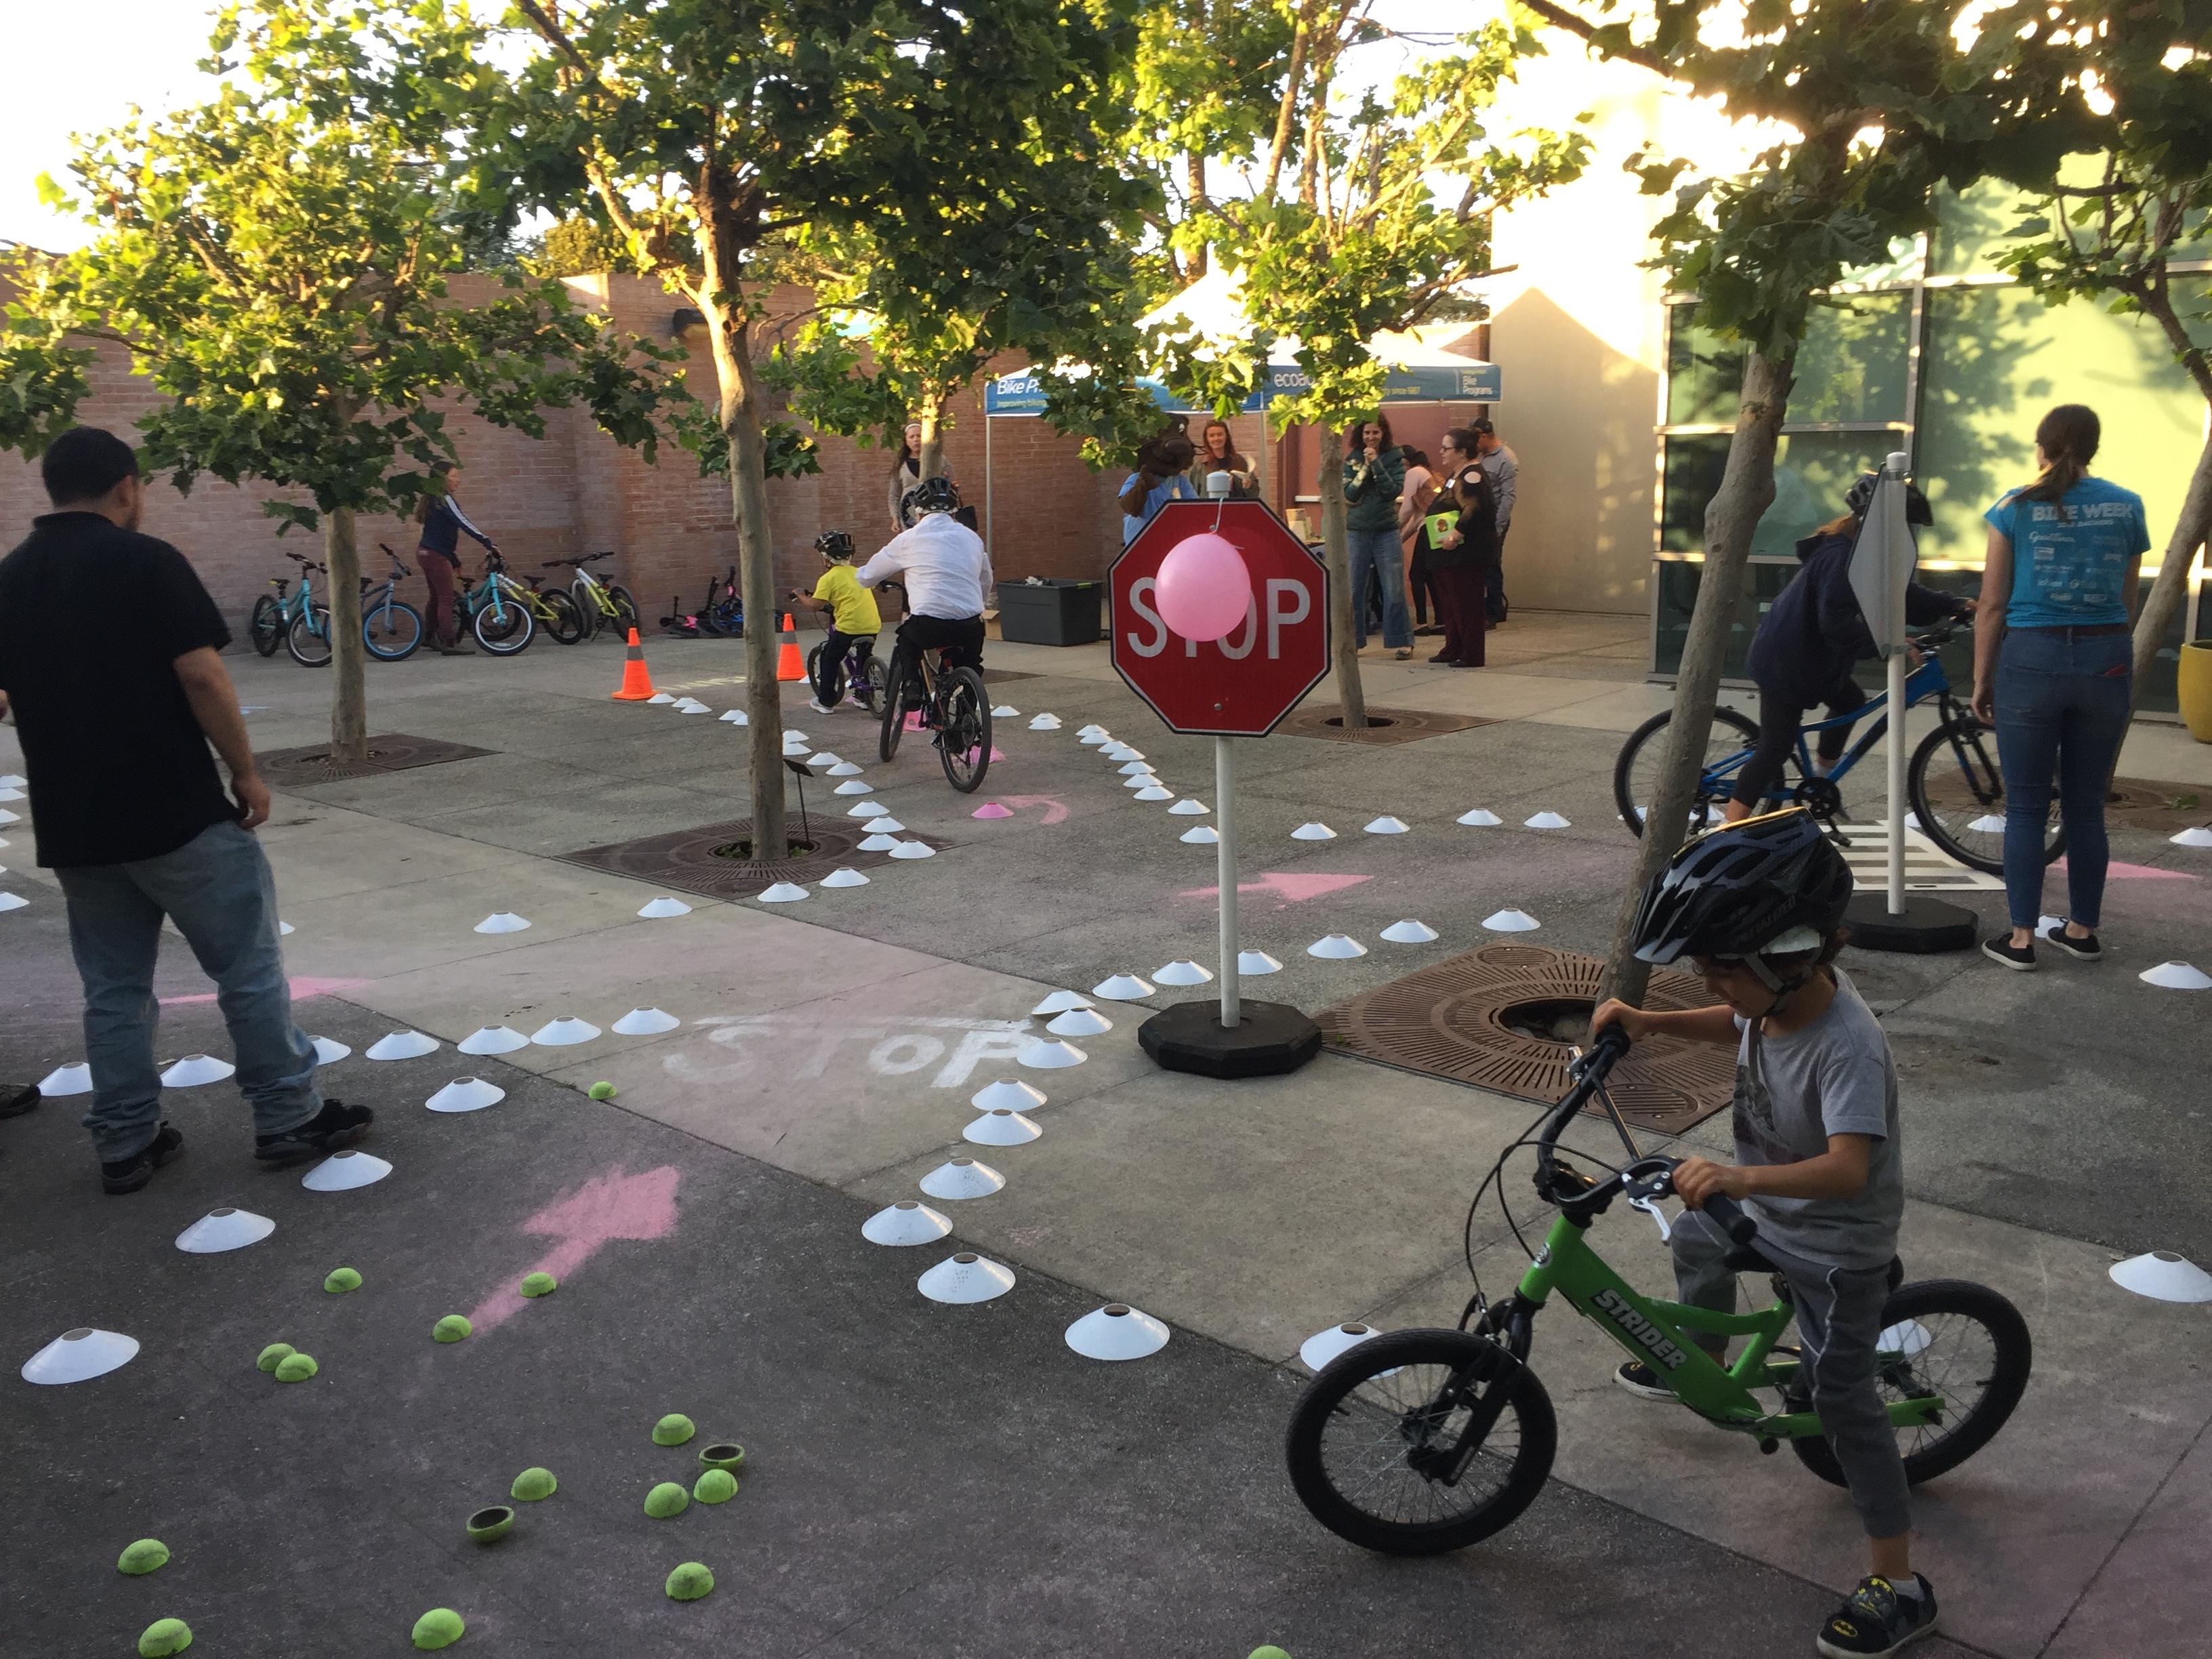 Kids riding on bikes